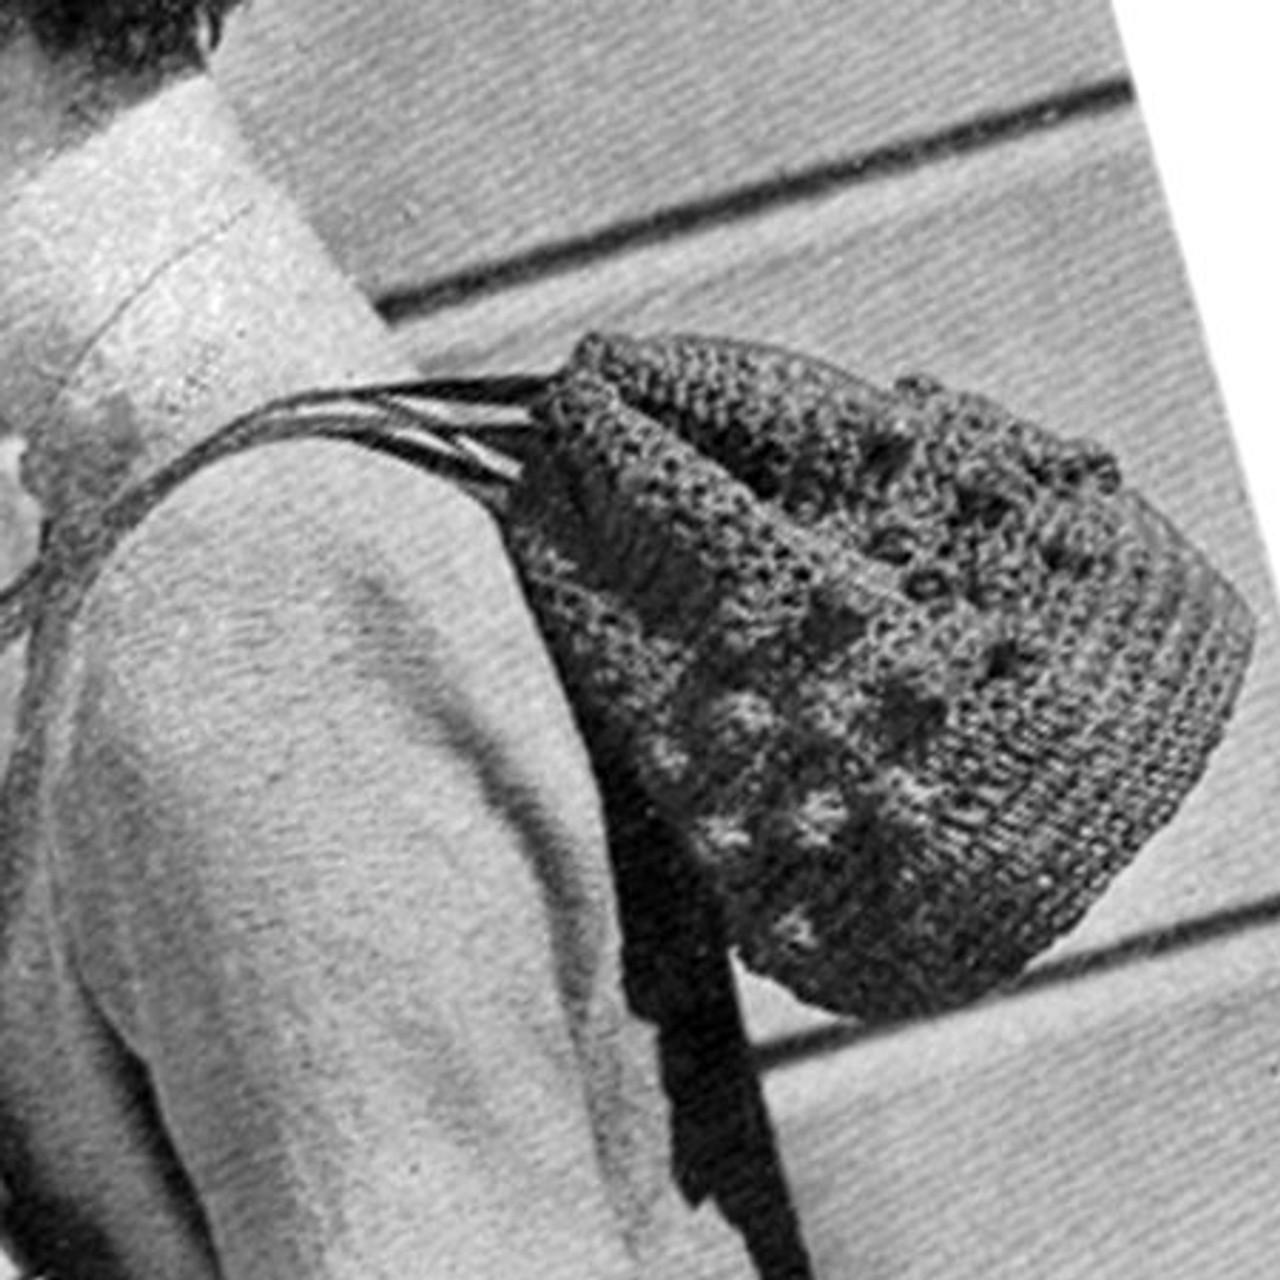 Crochet Drawstring Bag Pattern with Popcorn Band